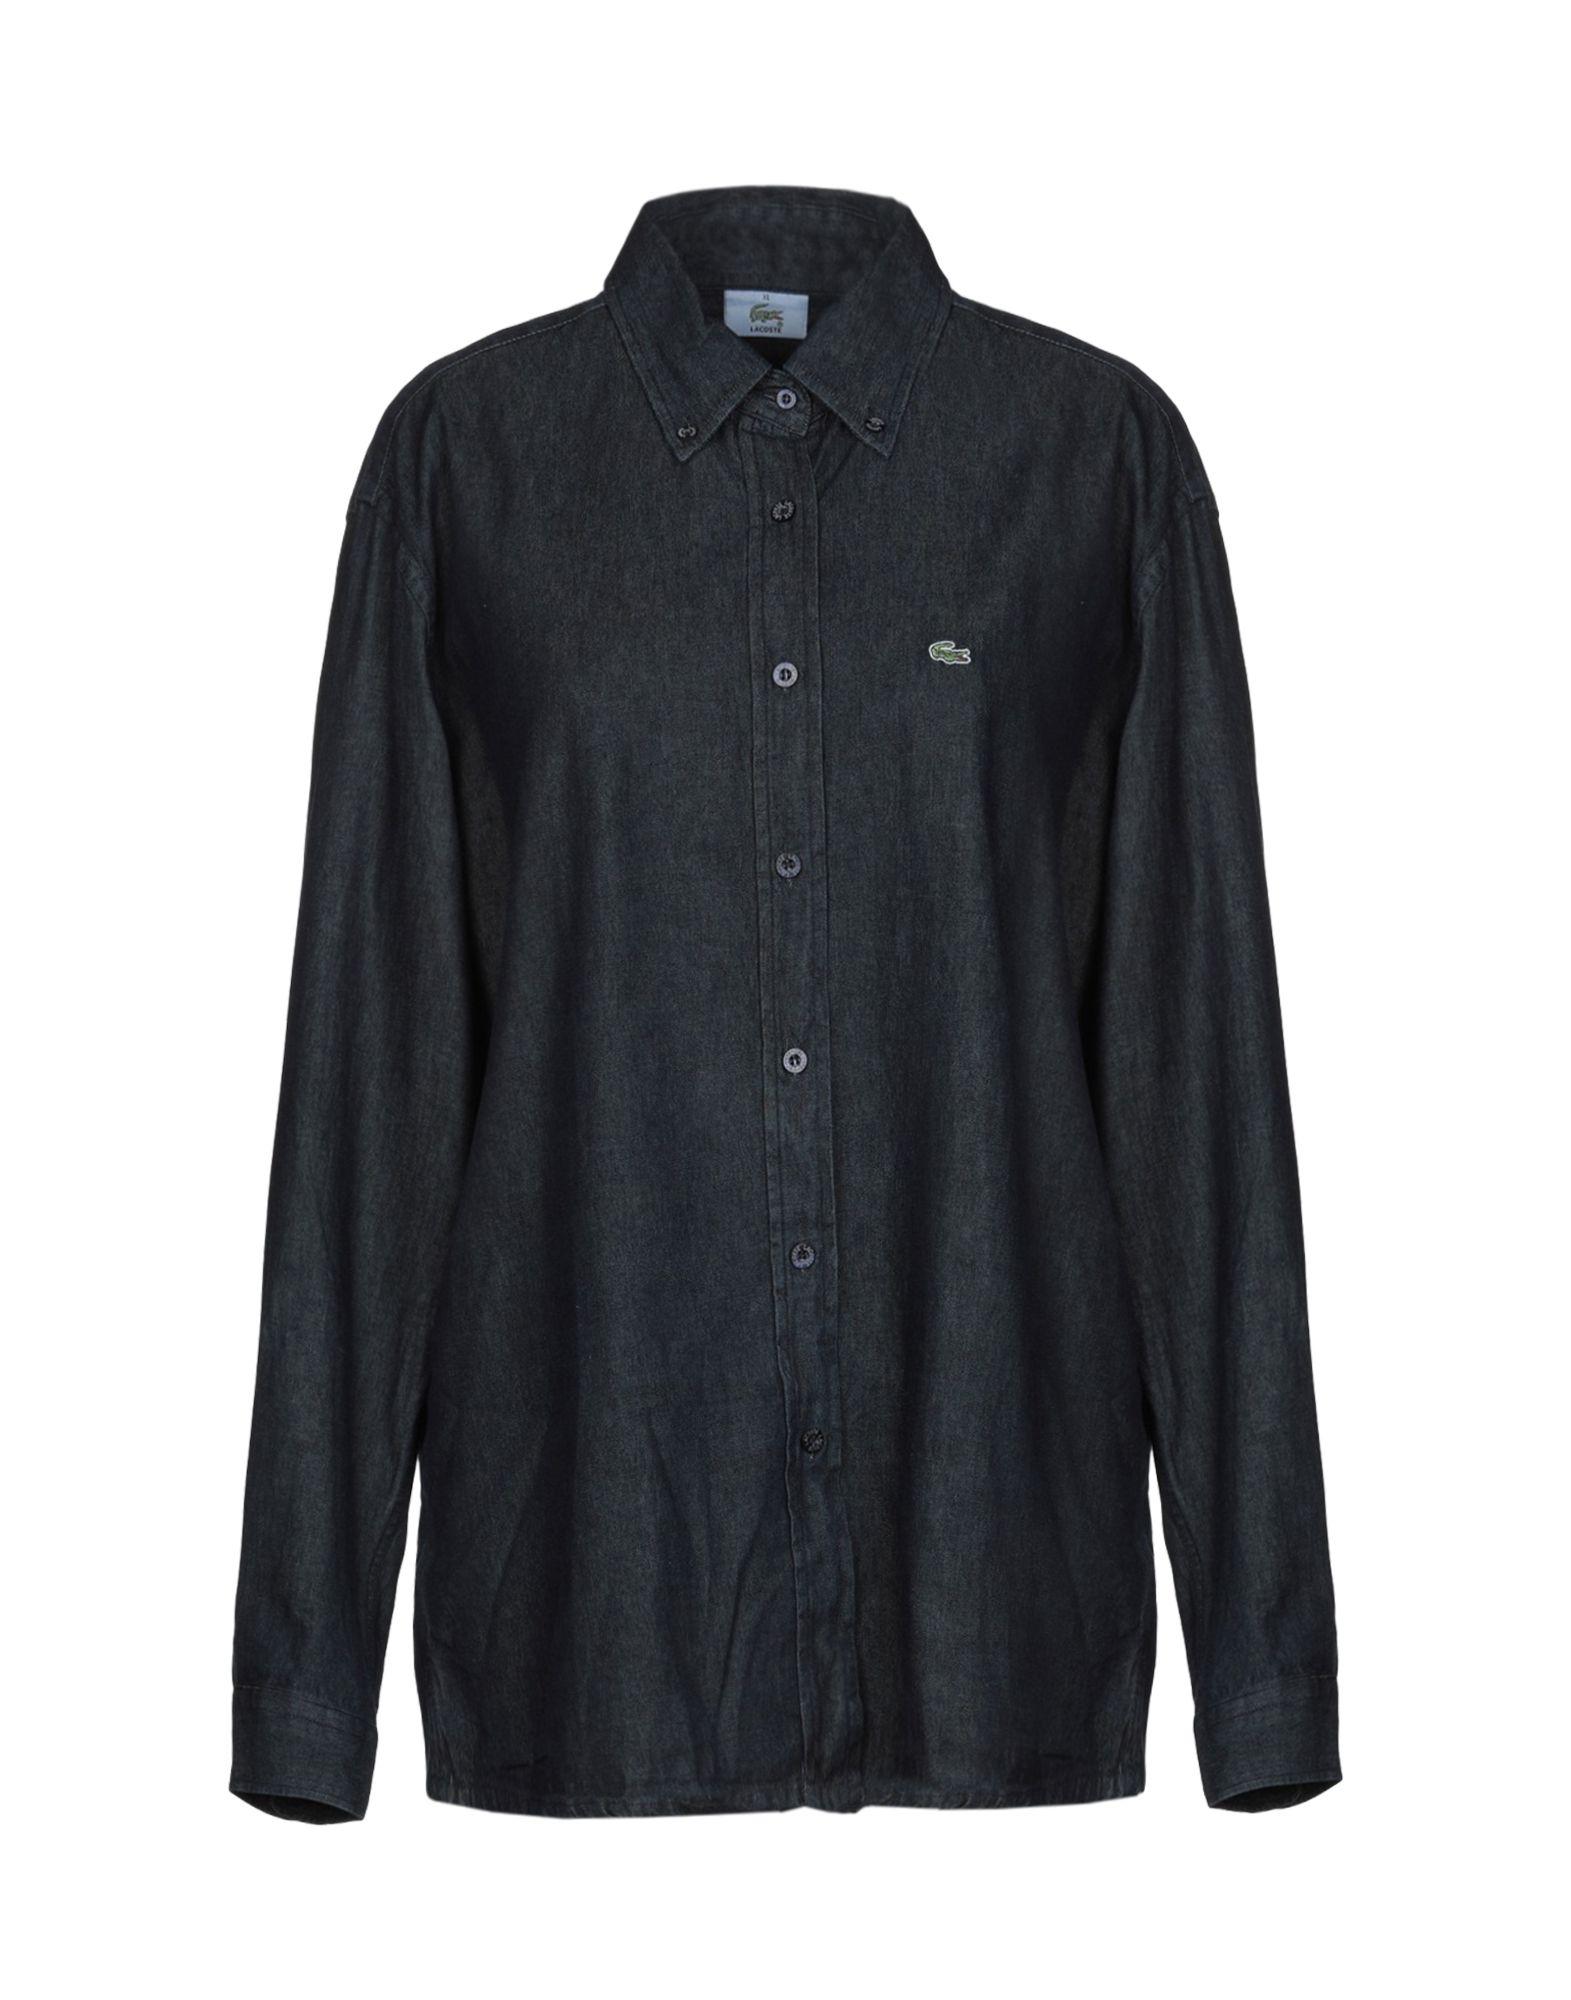 LACOSTE Джинсовая рубашка рубашка мужская lacoste ch0687dhki1 65 15